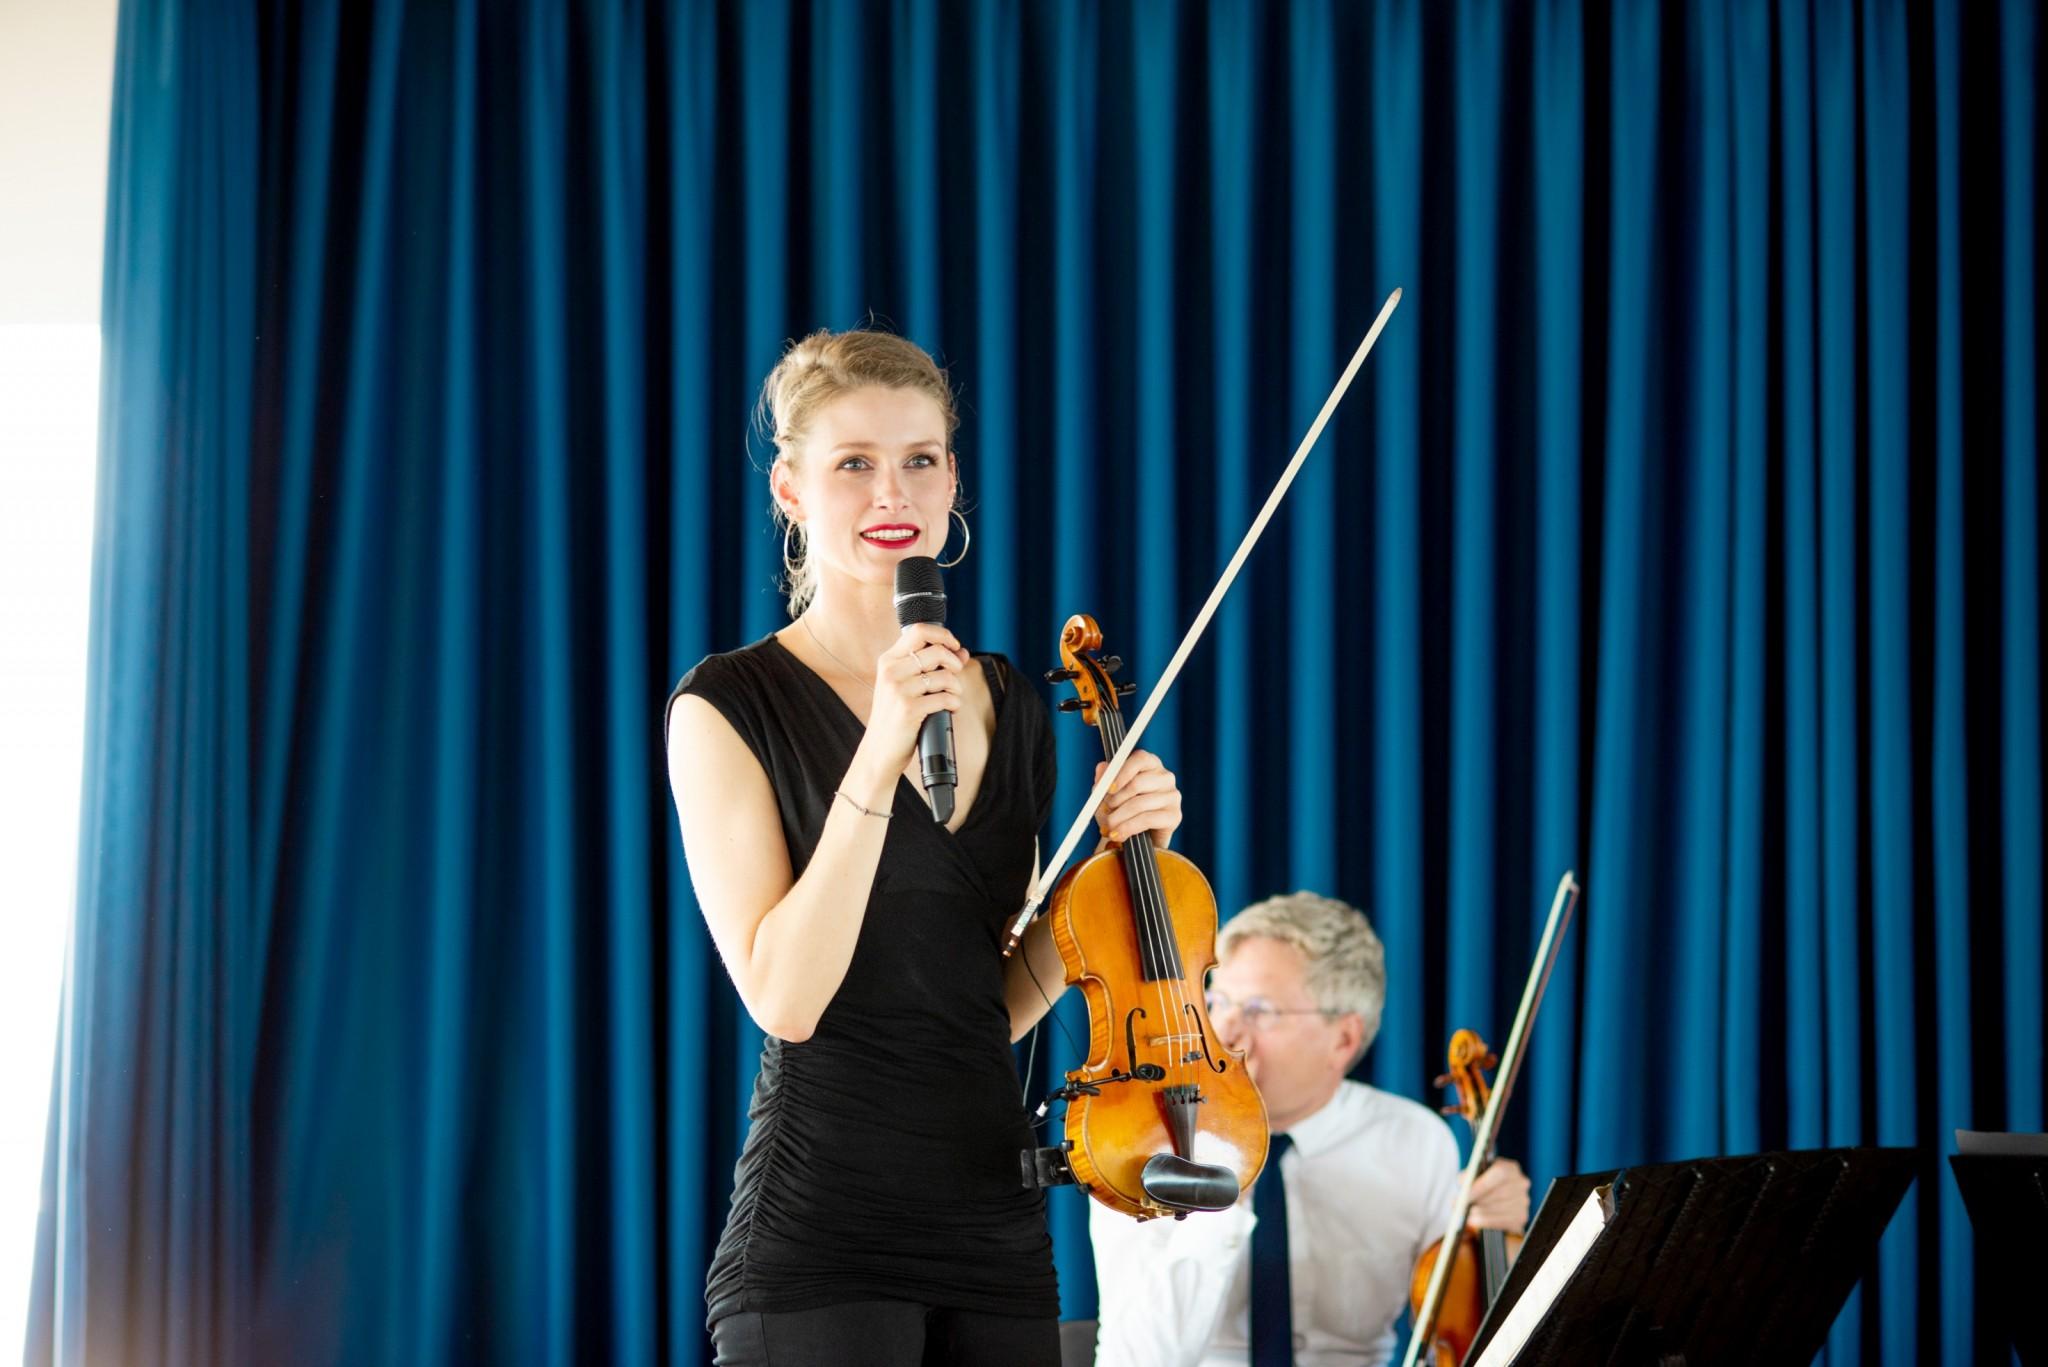 19-06-02 KN_Musik an Bord_c_Victor Marin Roman (8)